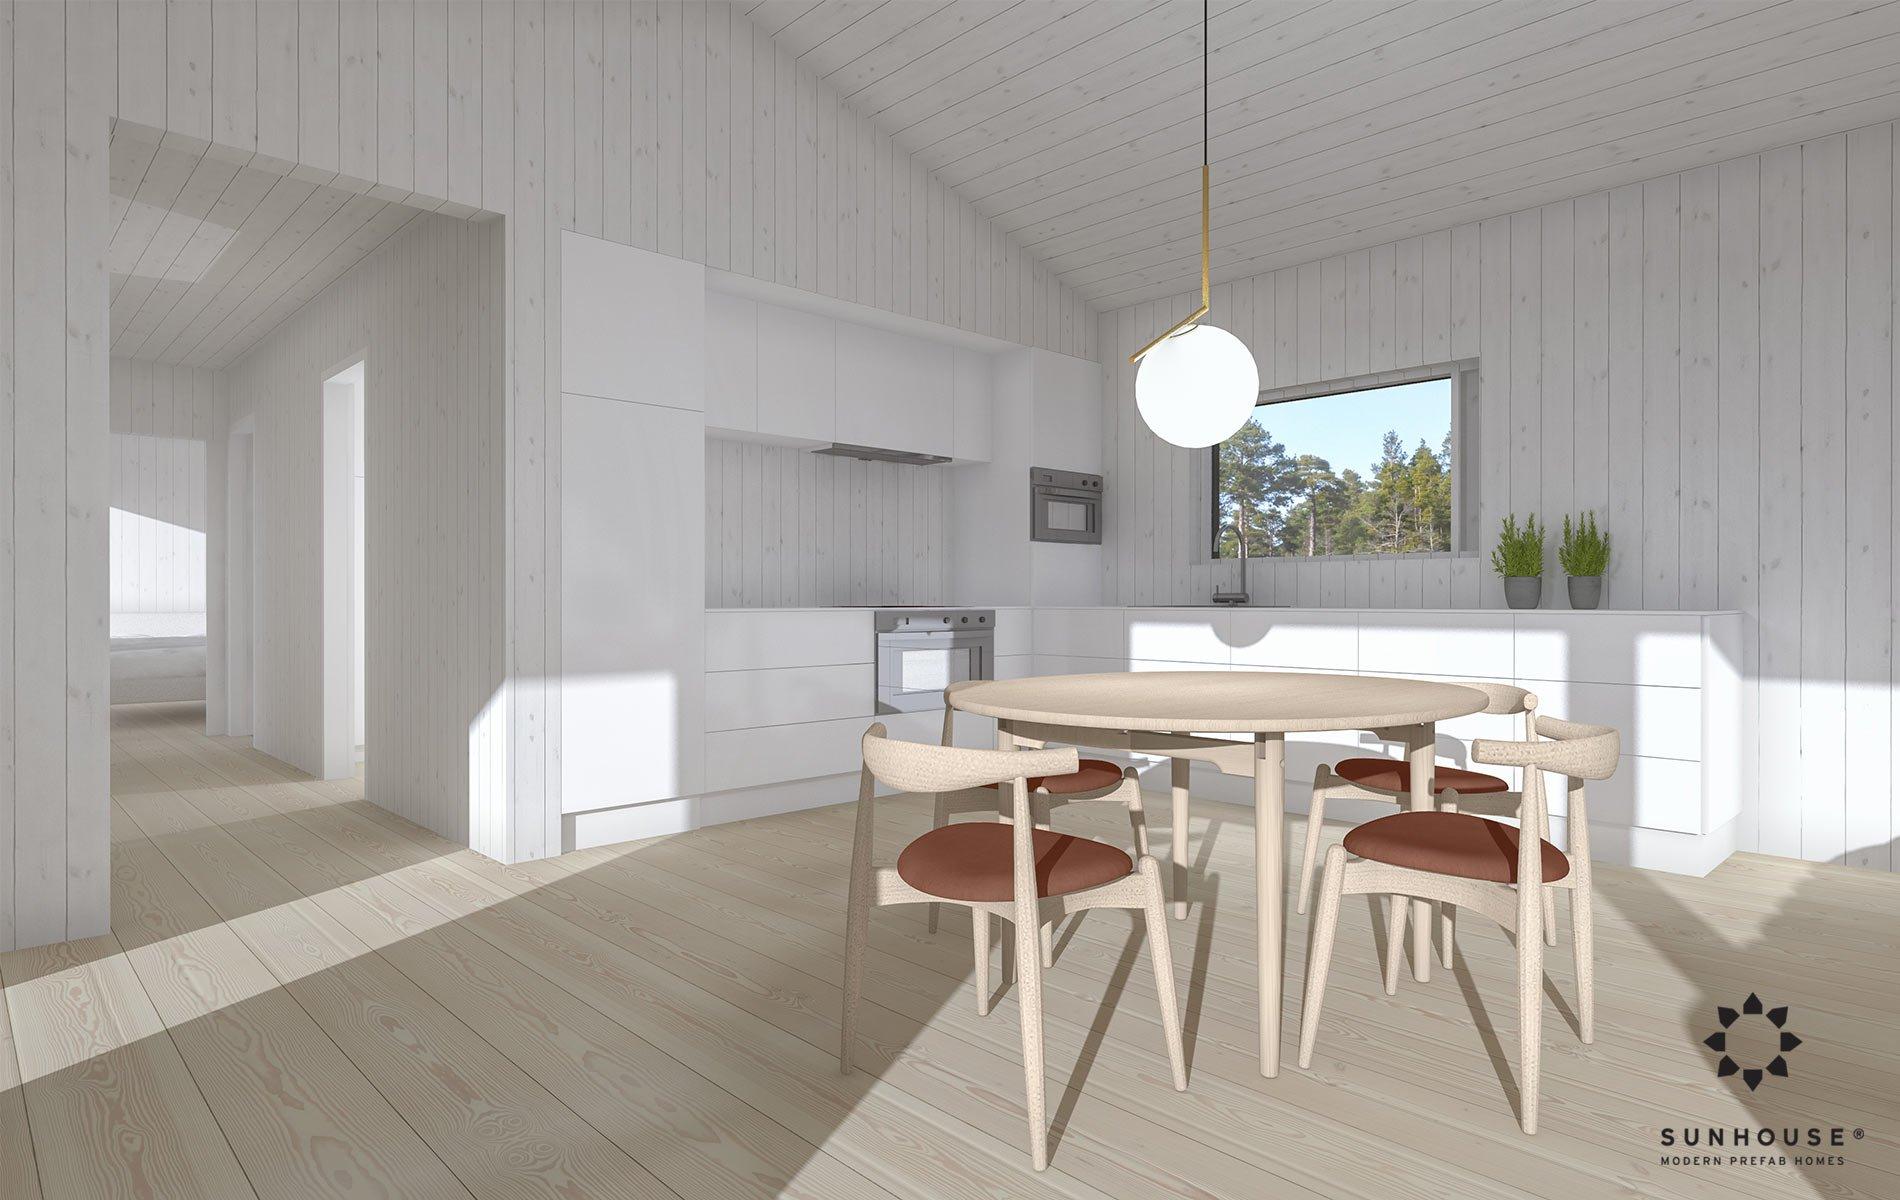 Sunhouse S180062 - Moderni huvila